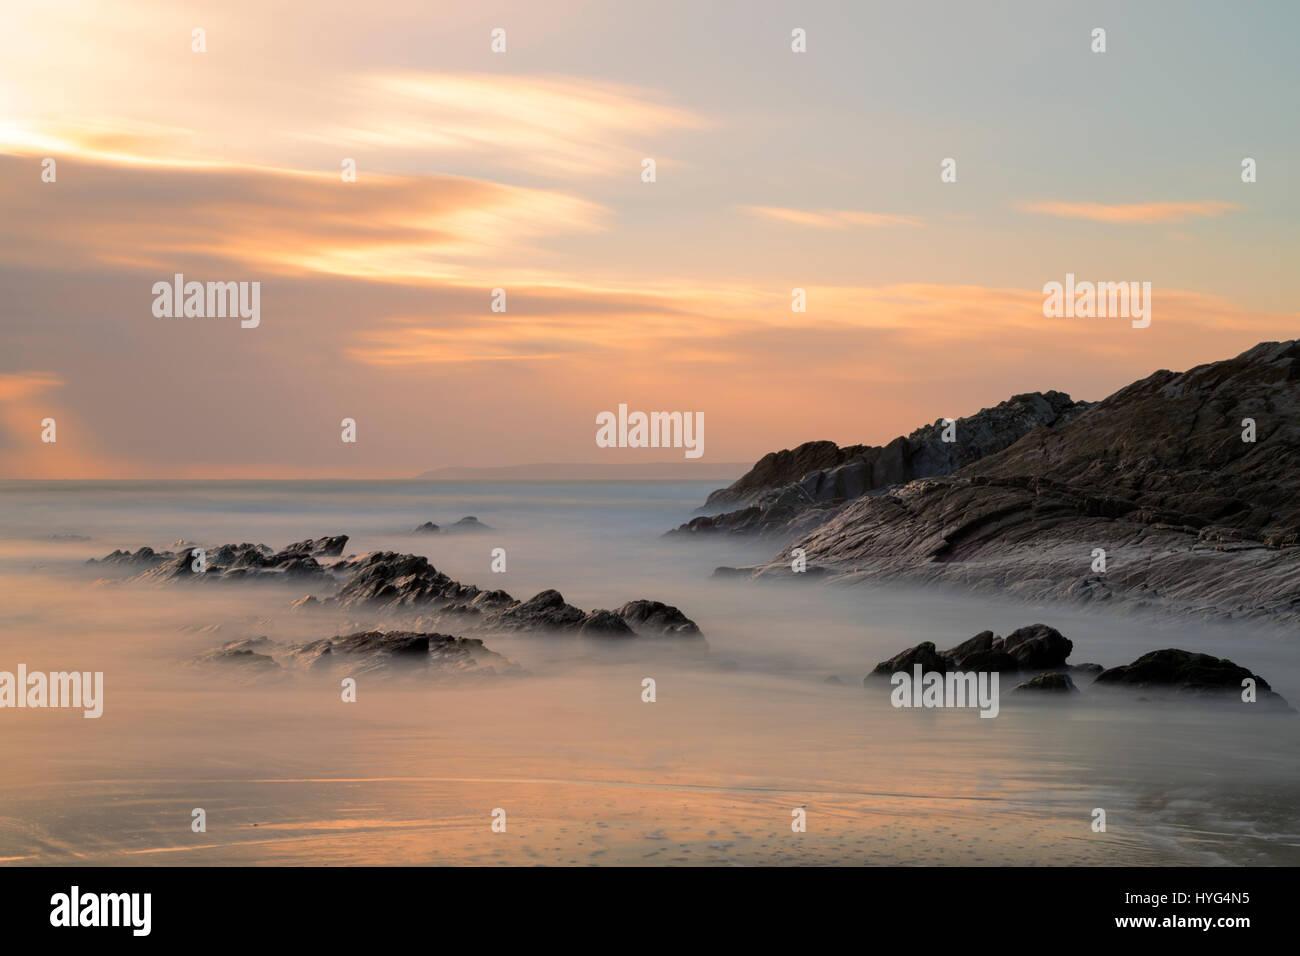 Sunset at Sharrow Point on the Rame Peninsula - Stock Image